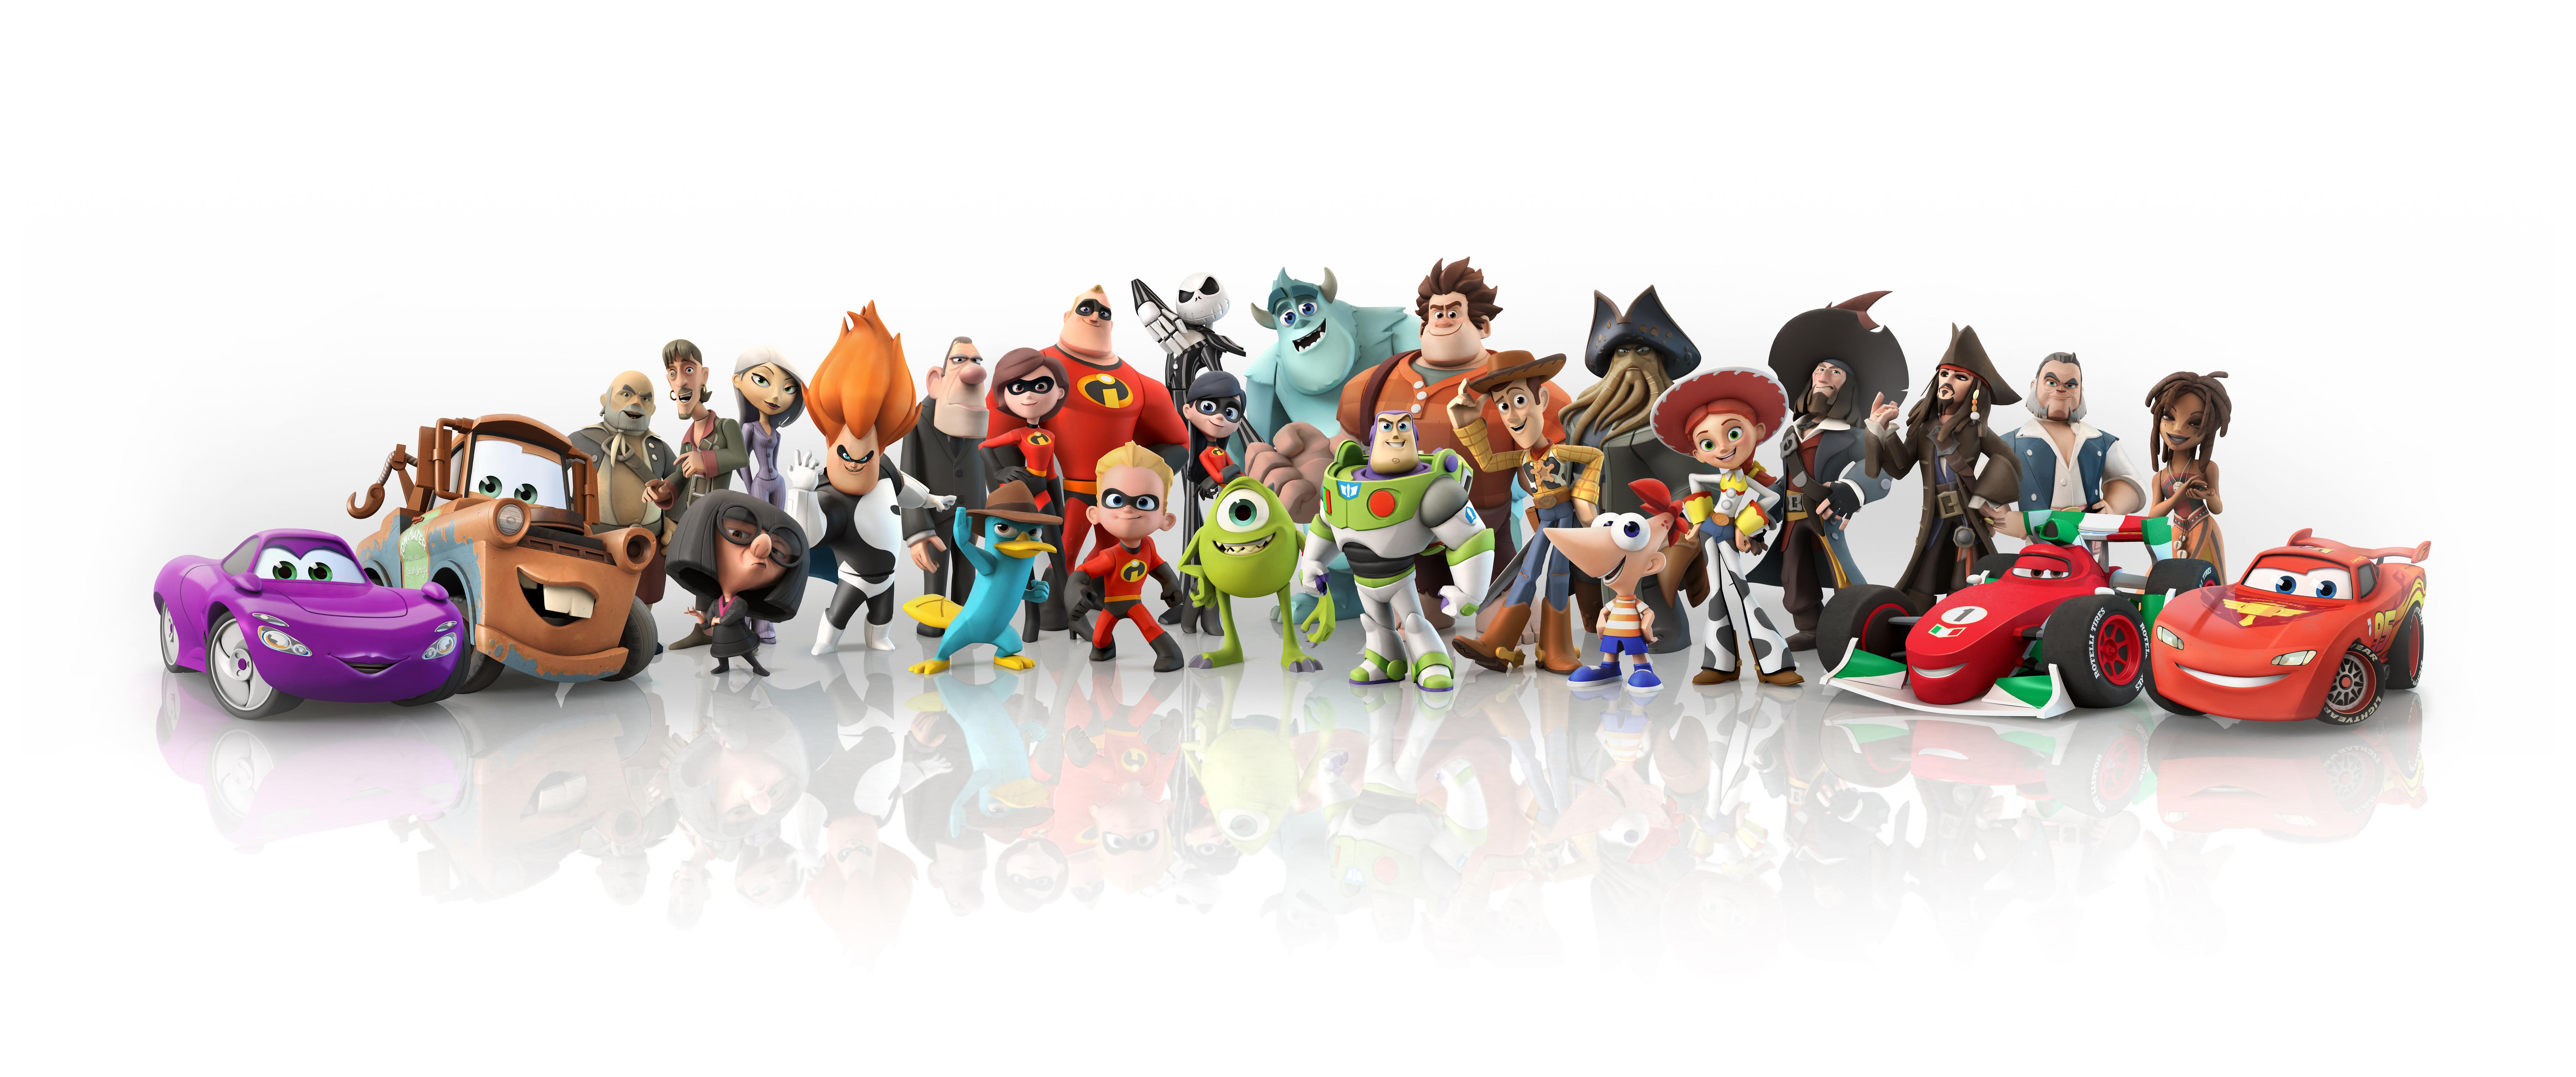 infinity games disney pixar e3 2013 disney pixar the game 1680x1050